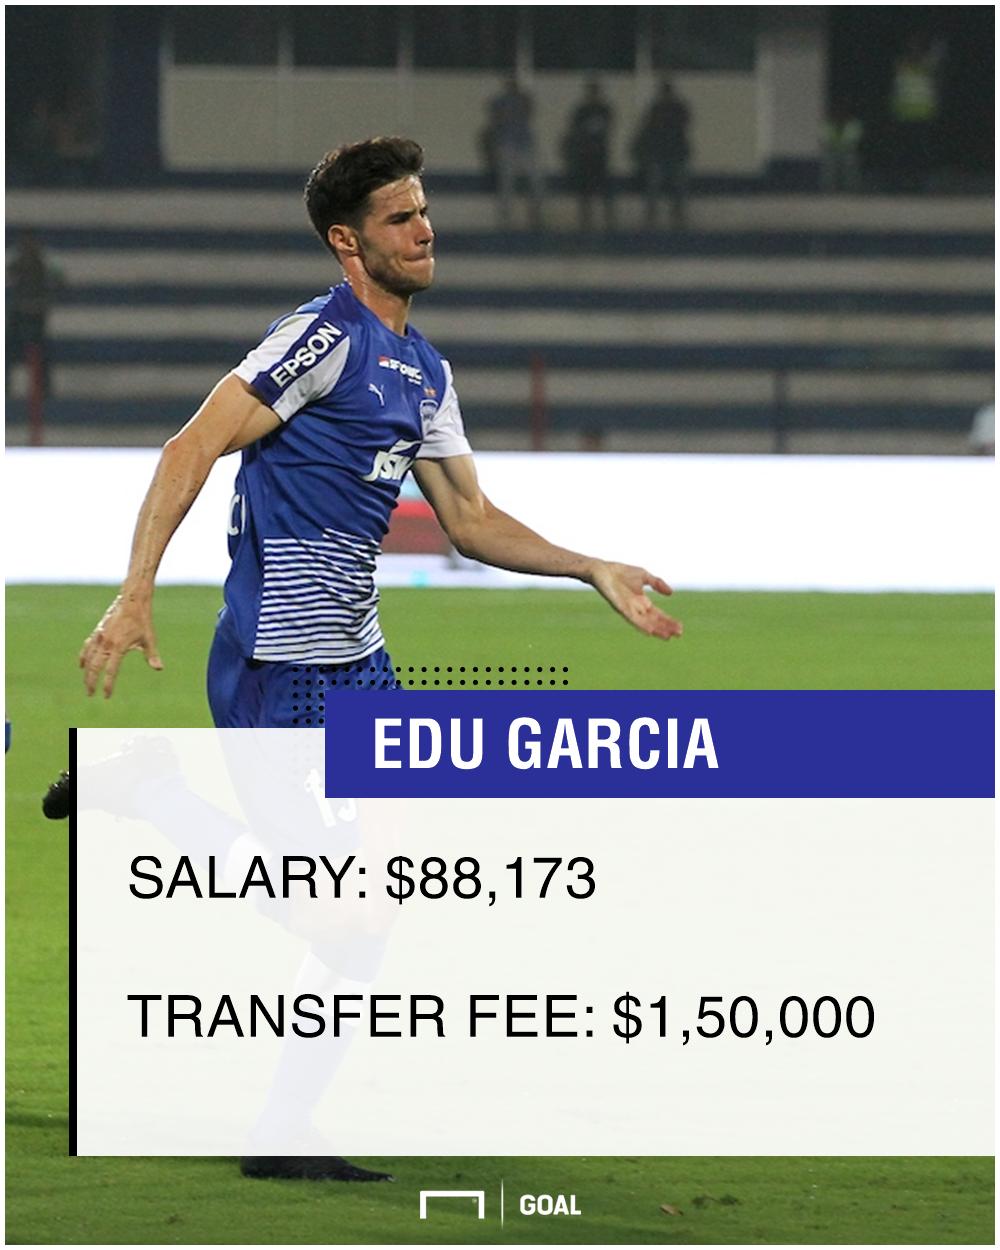 Edu Garcia salary